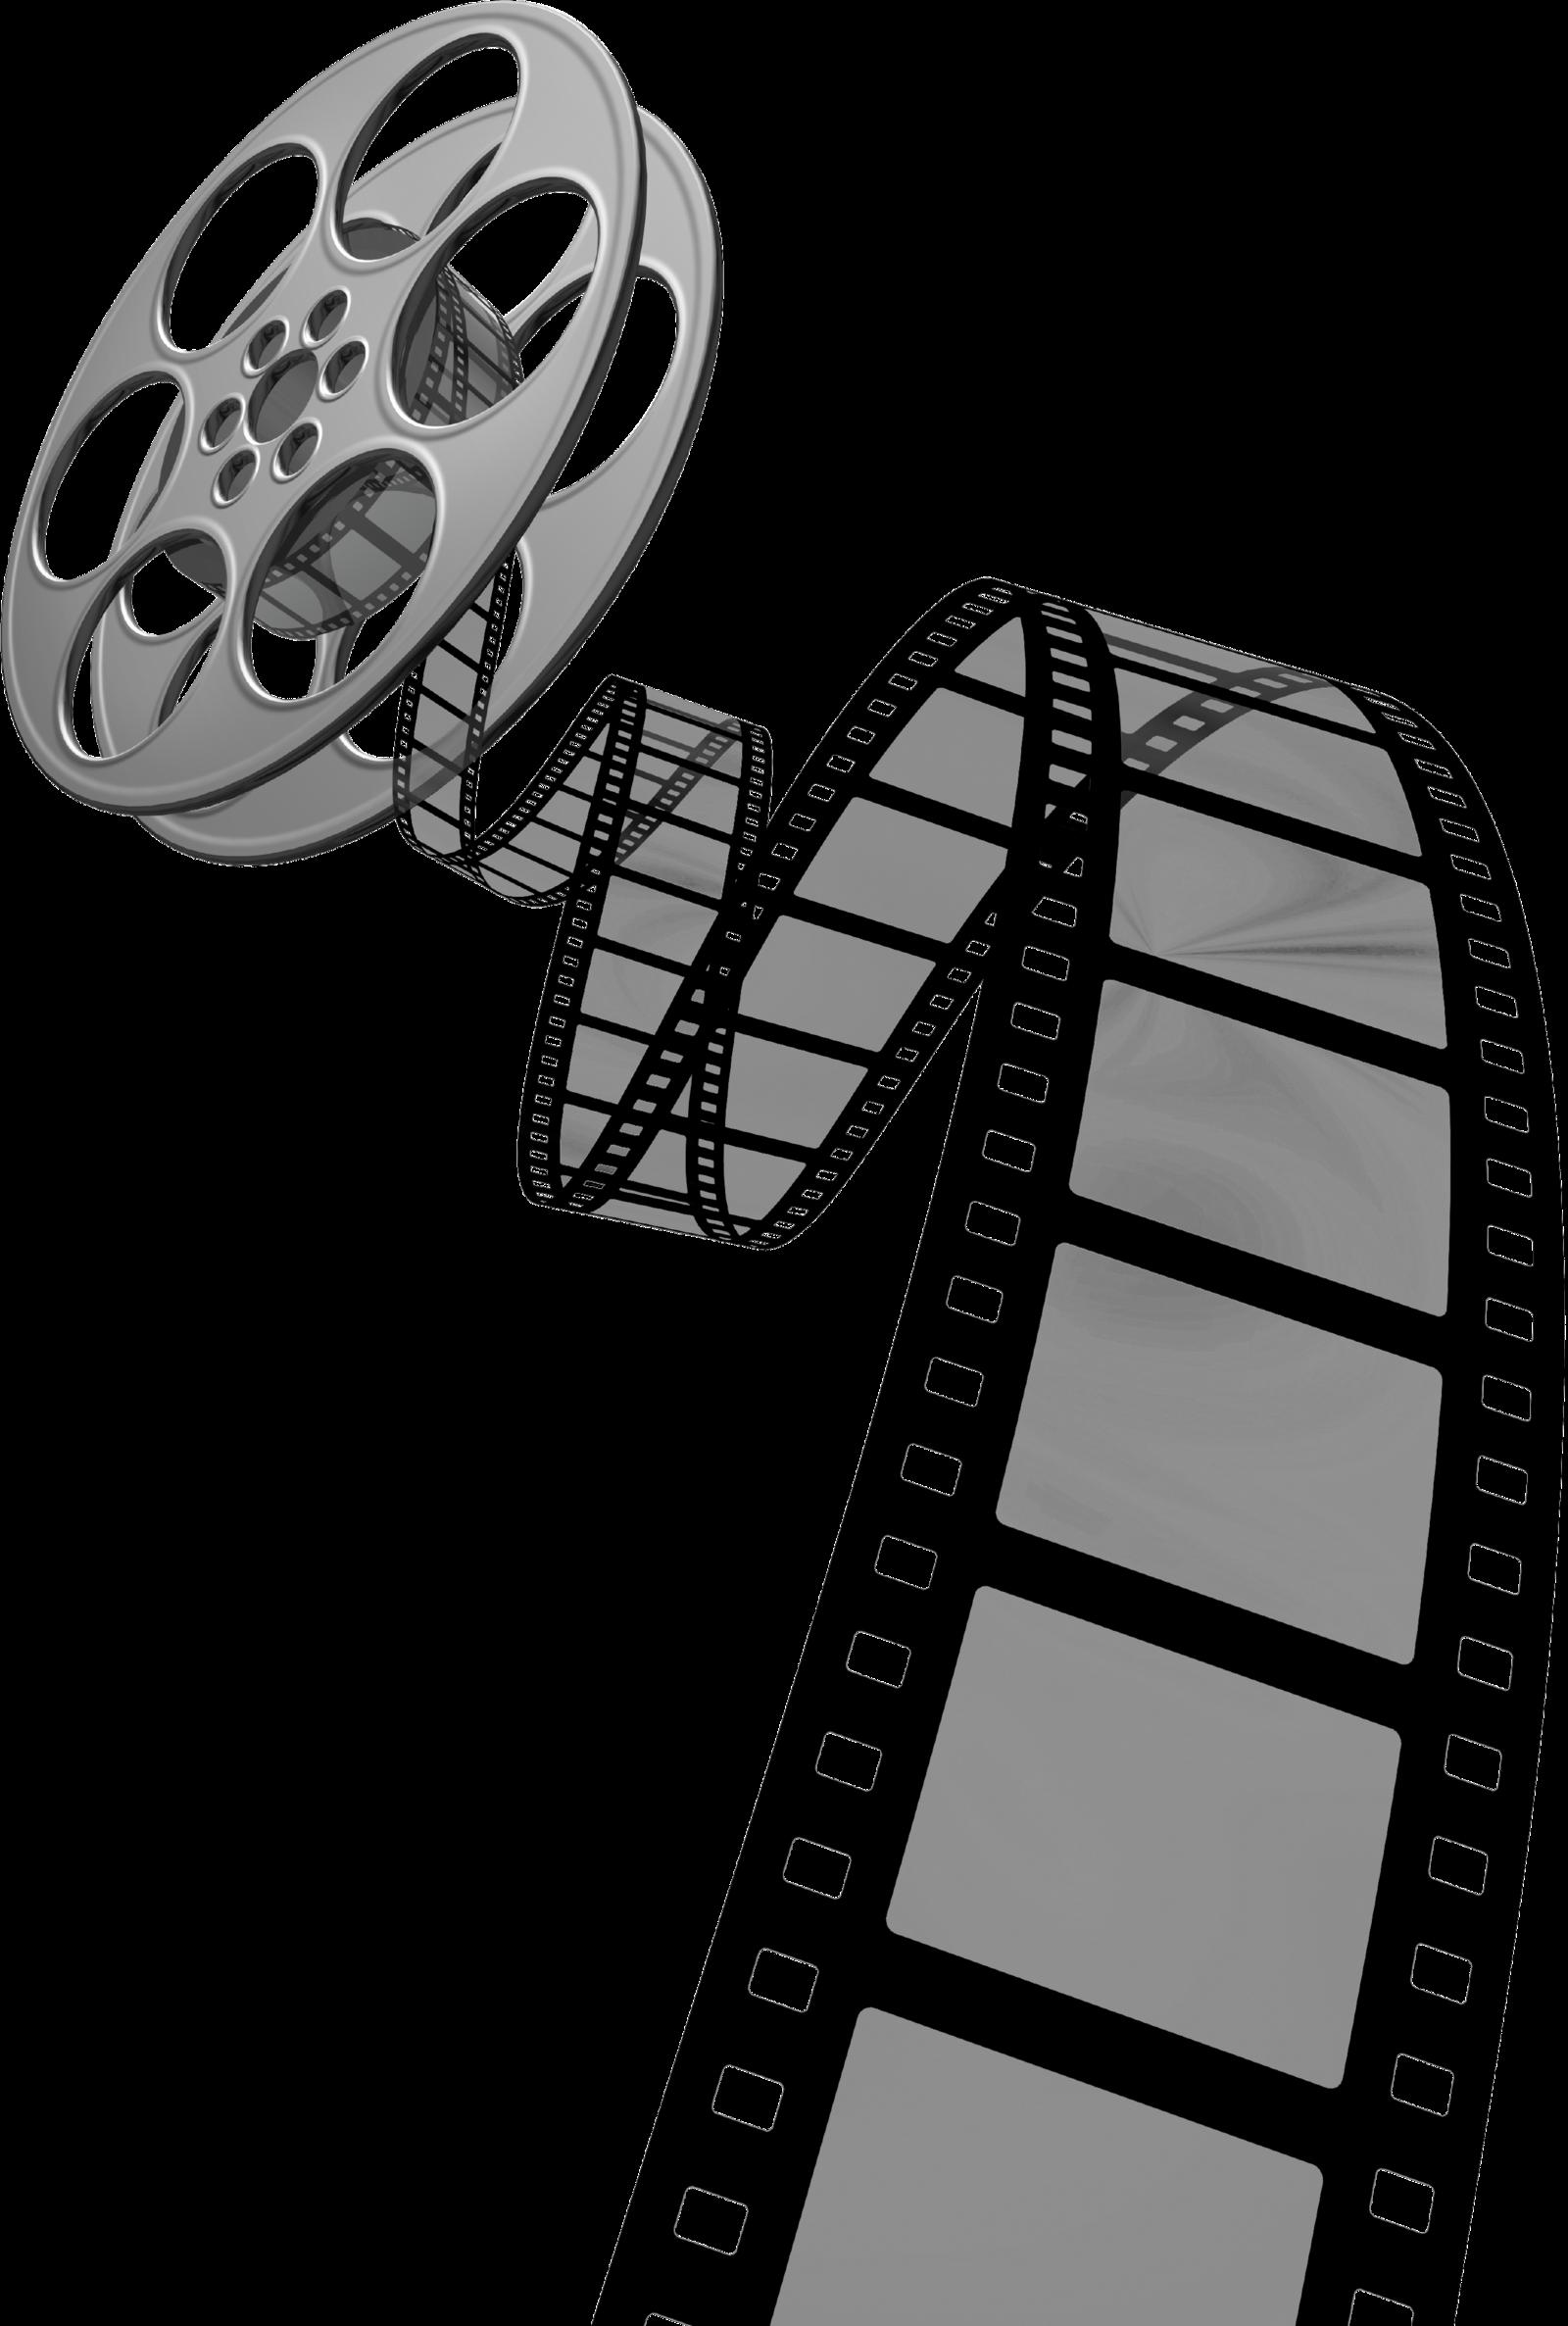 355 Movie Reel free clipart.